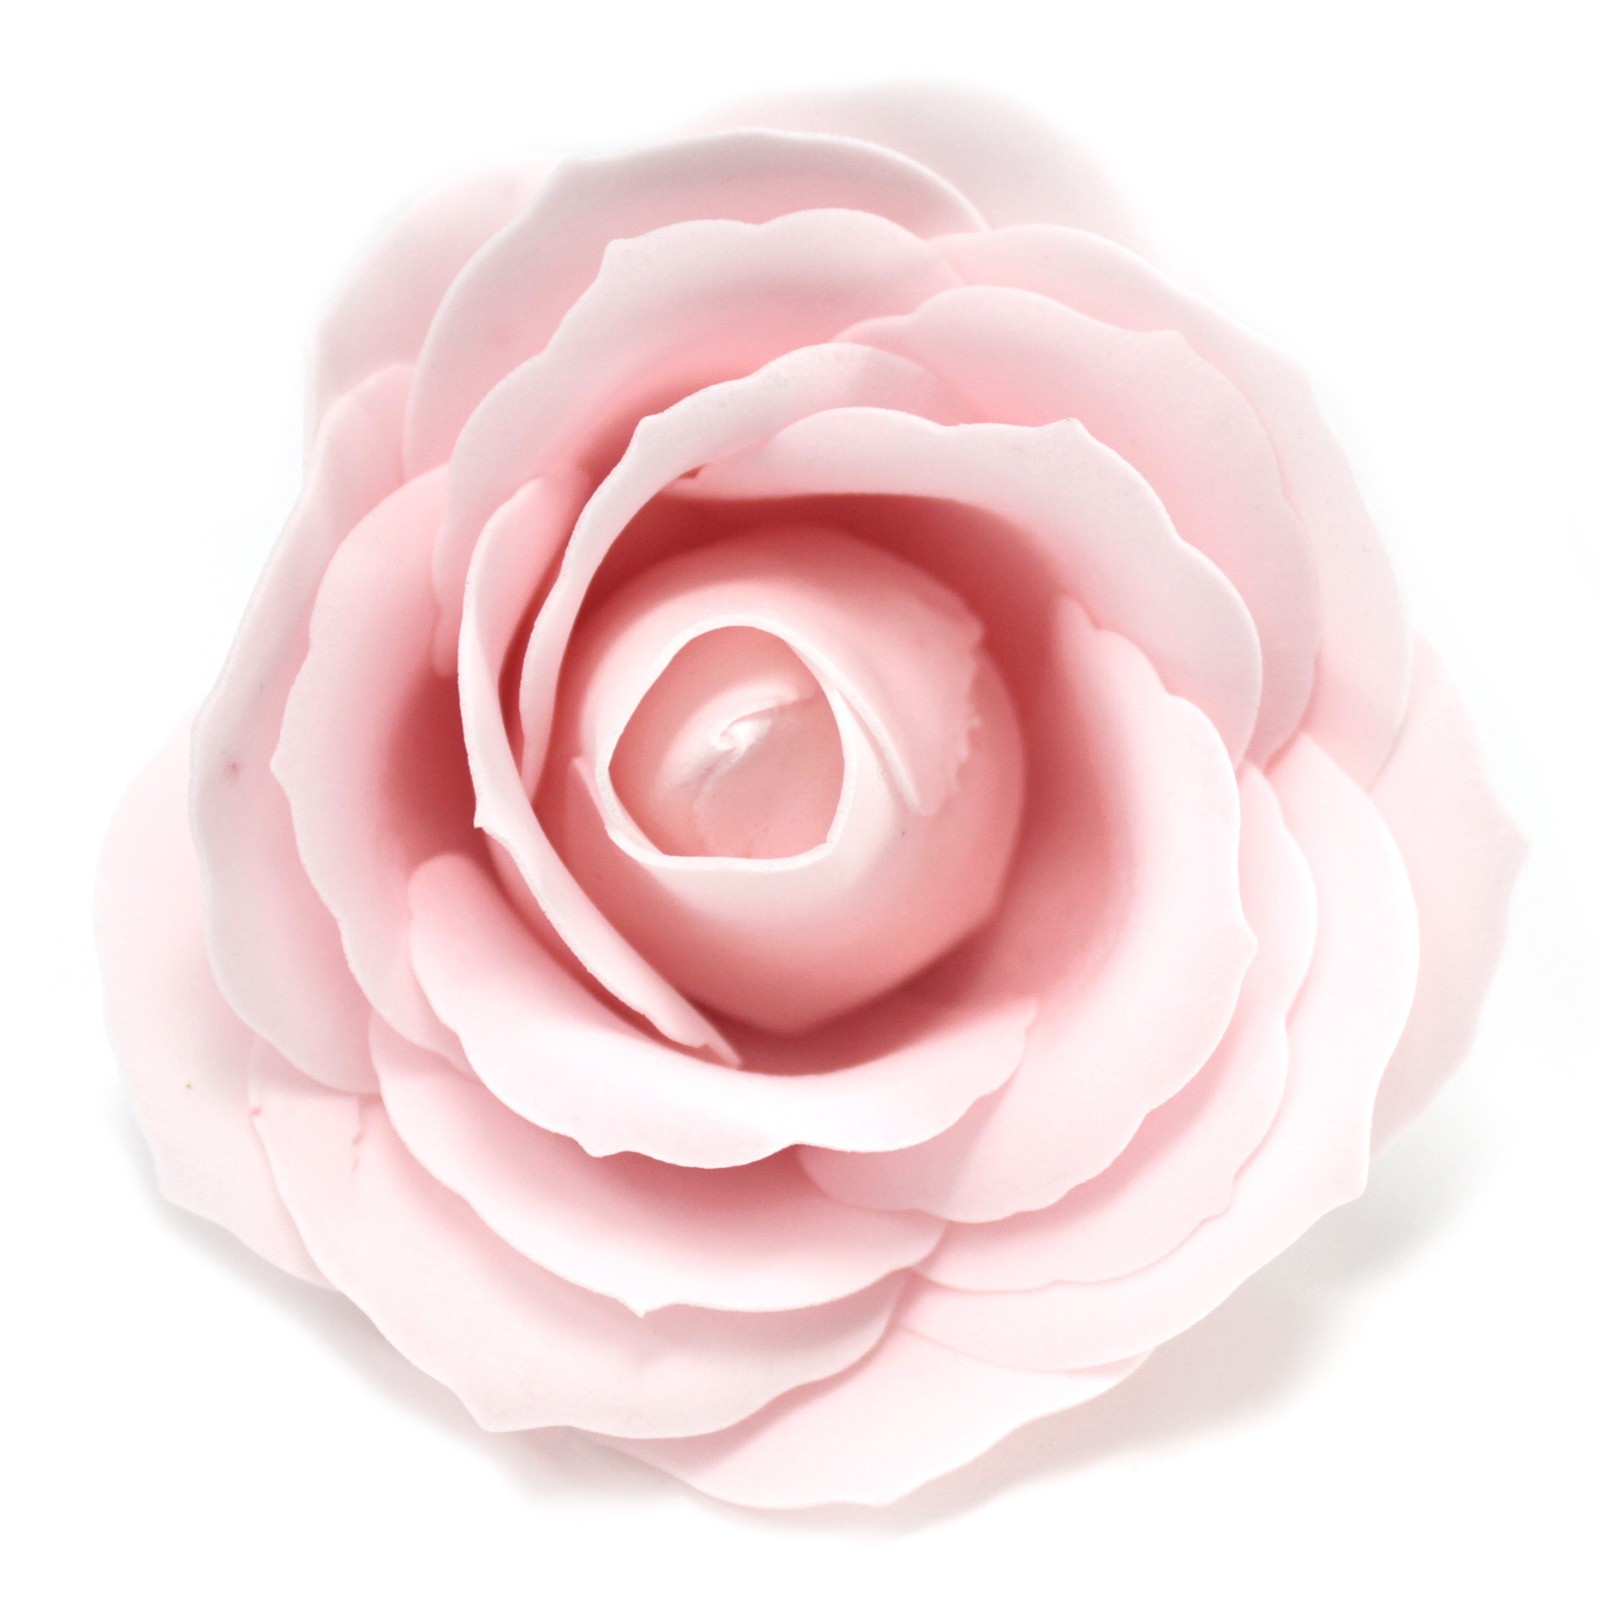 Craft Soap Flowers Lrg Rose Pink